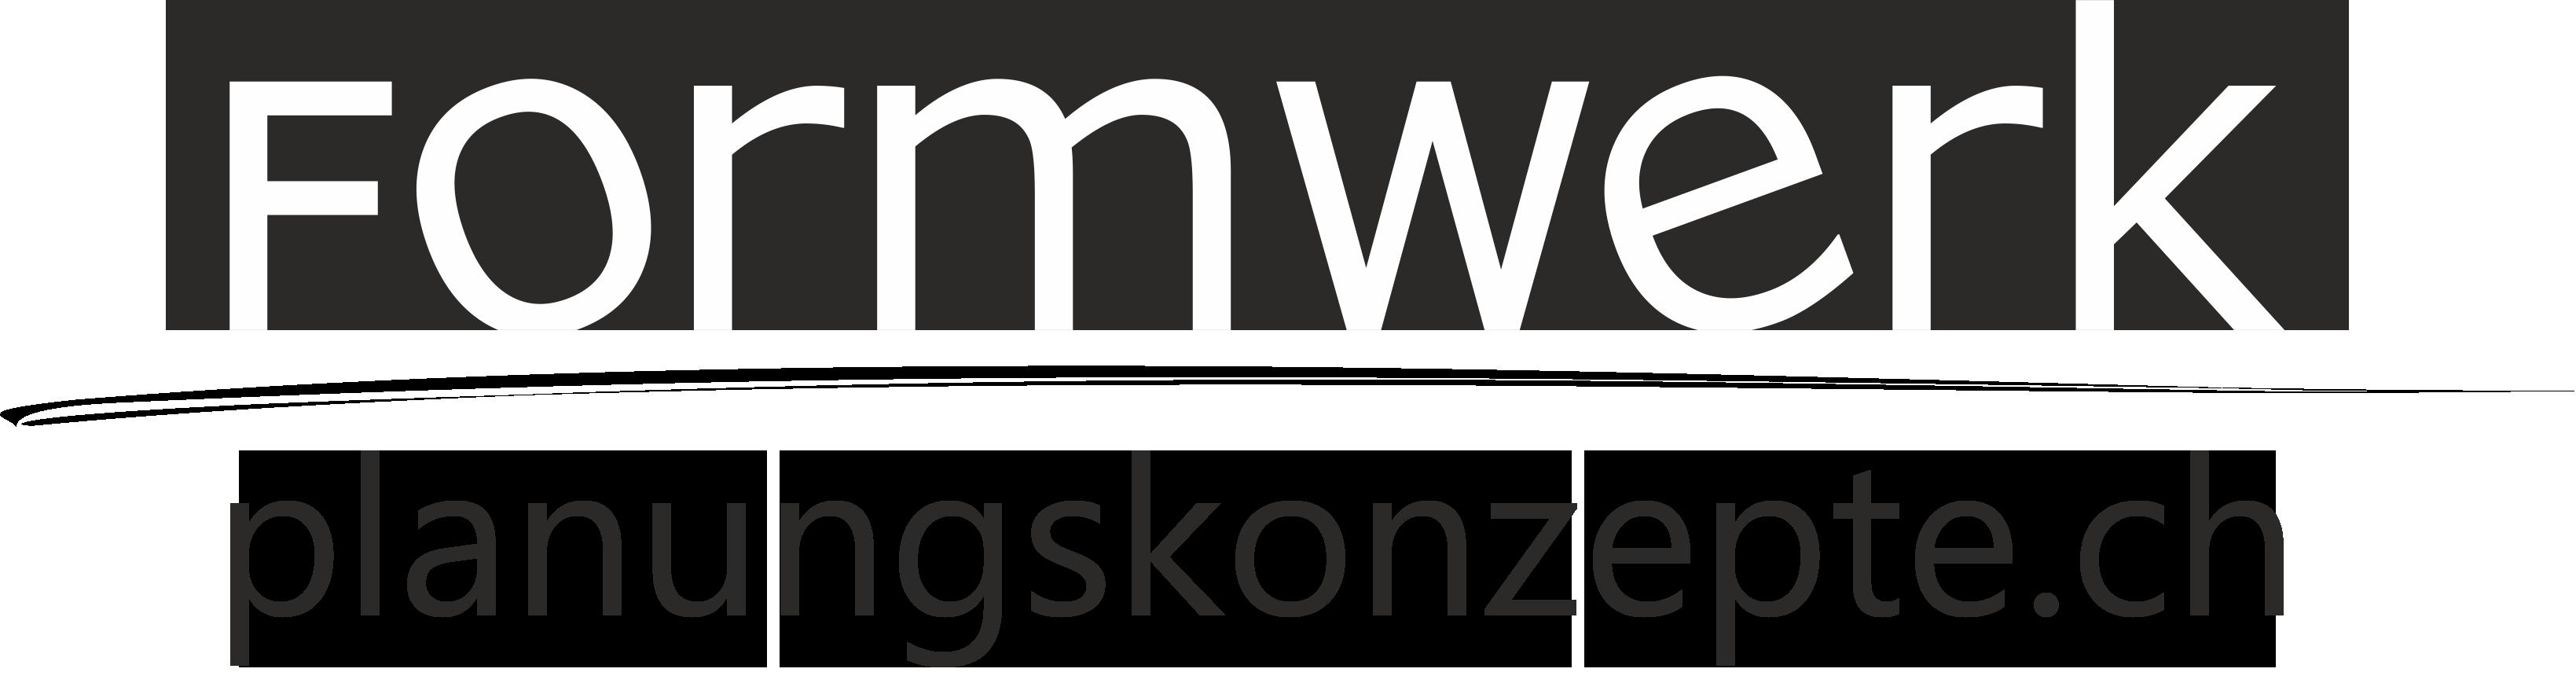 Formwerk Logo